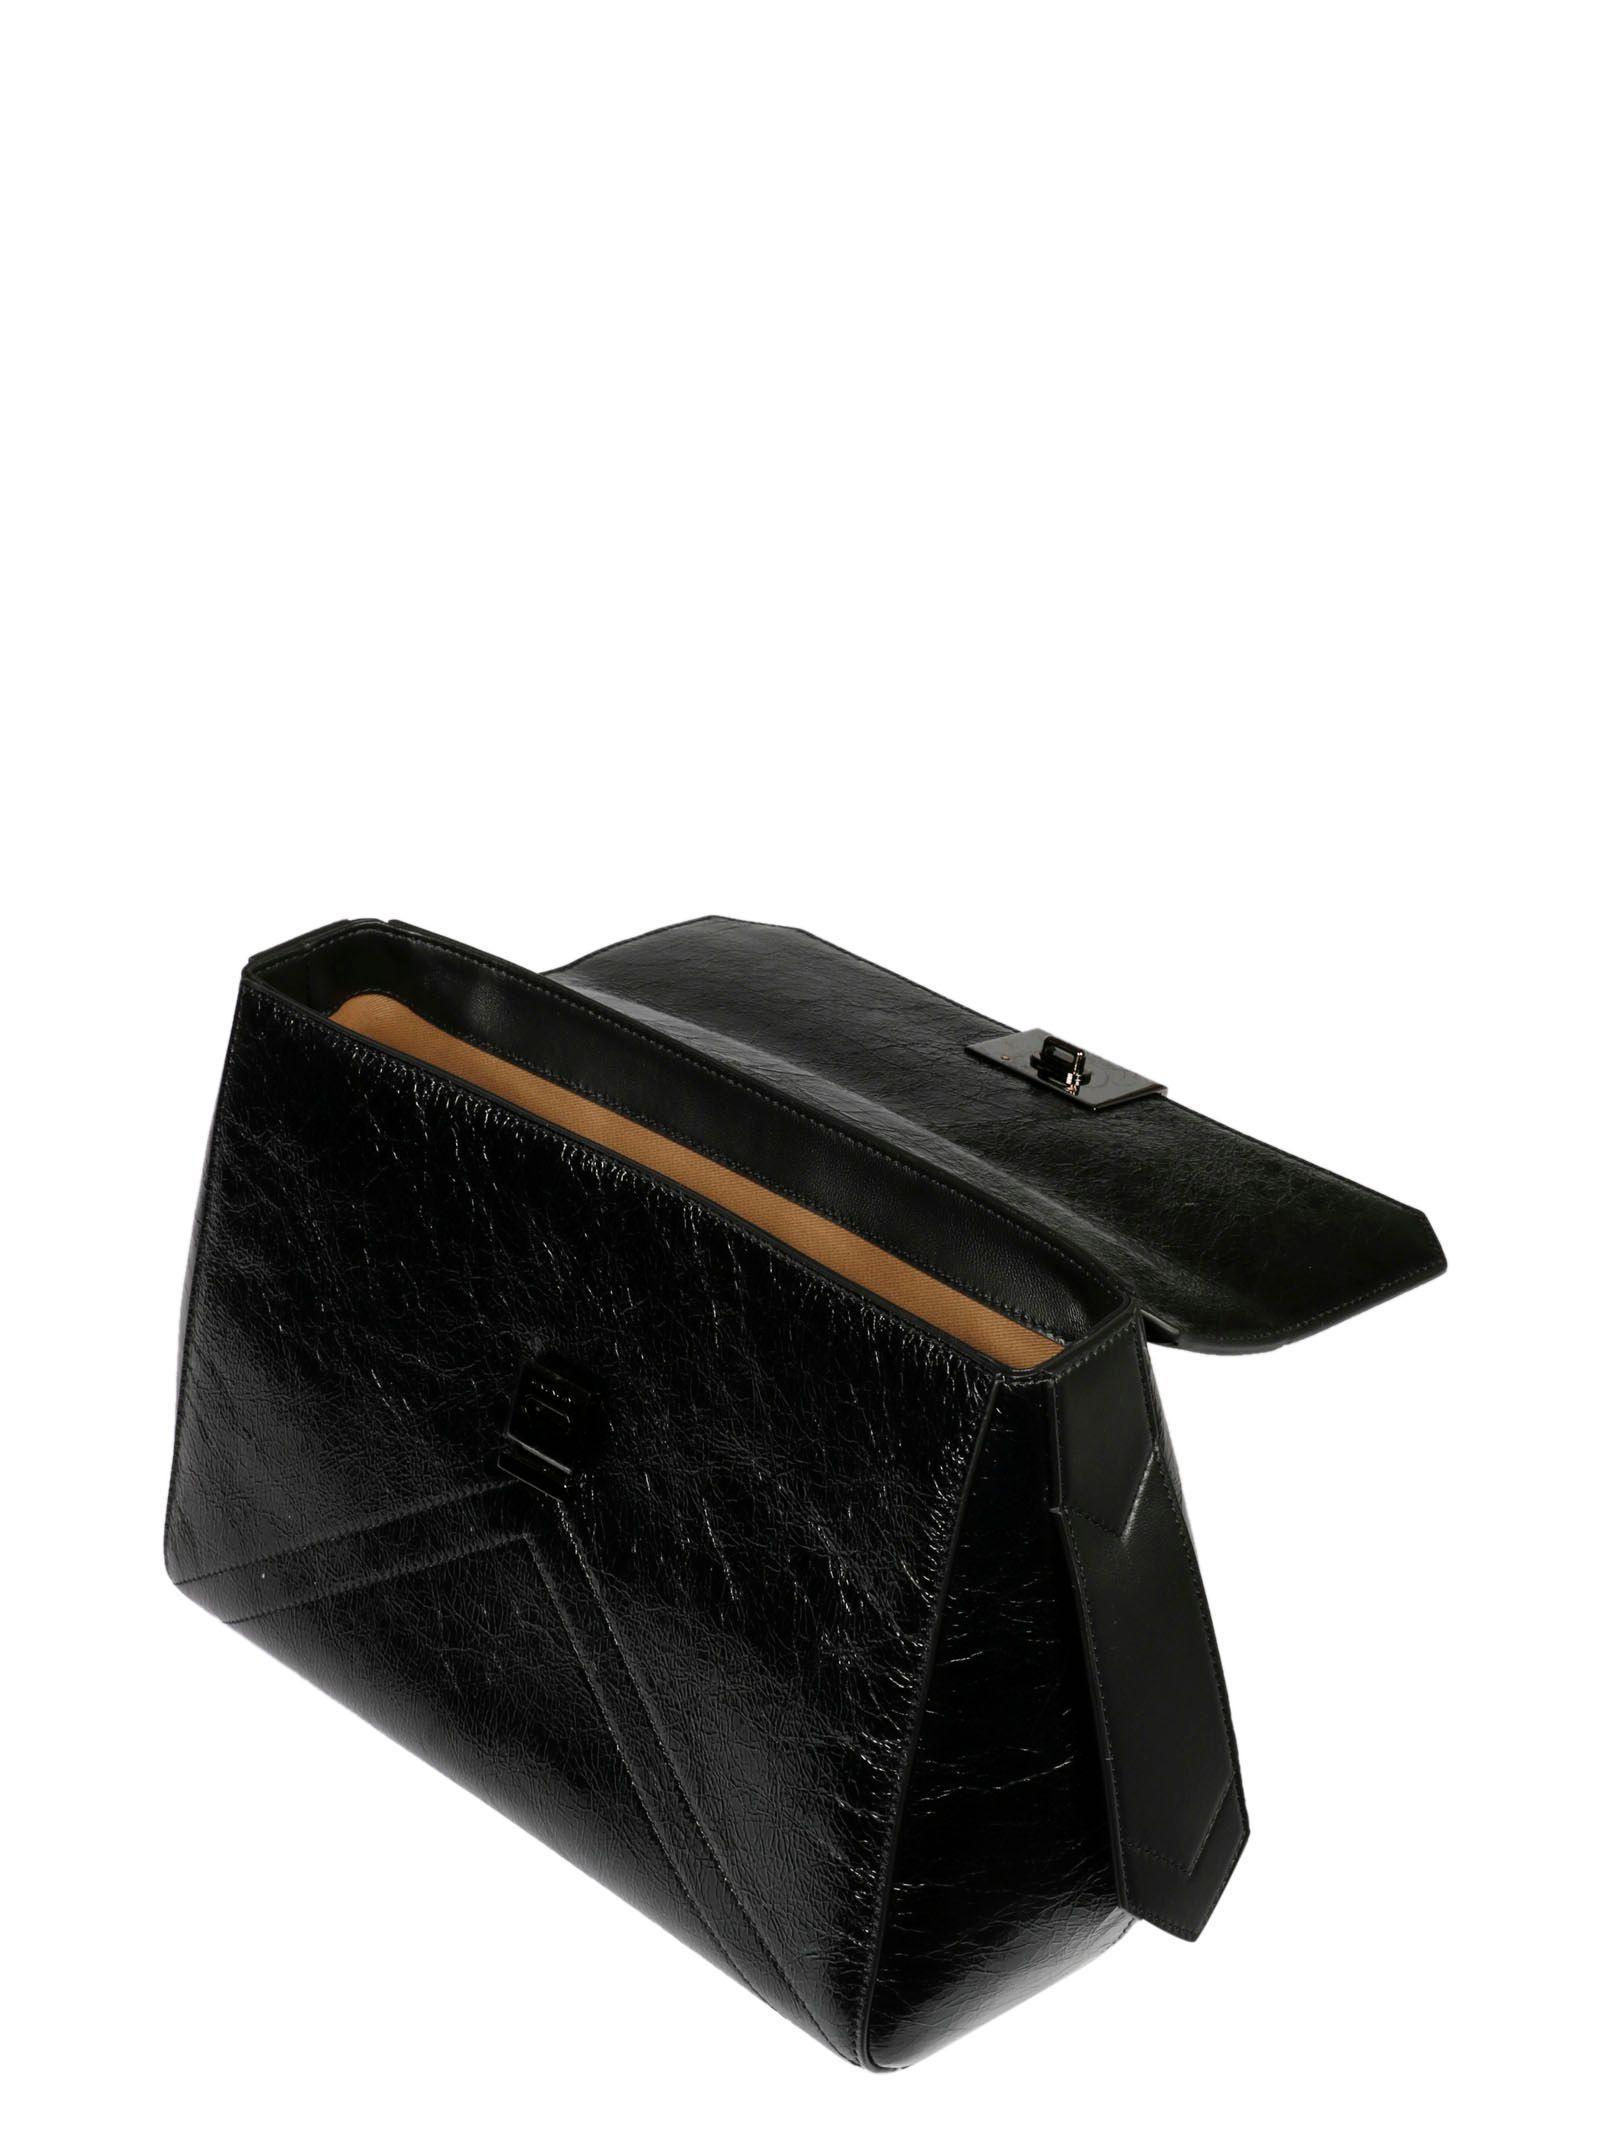 GIVENCHY WOMEN'S BB50C4B0TT001 BLACK LEATHER HANDBAG